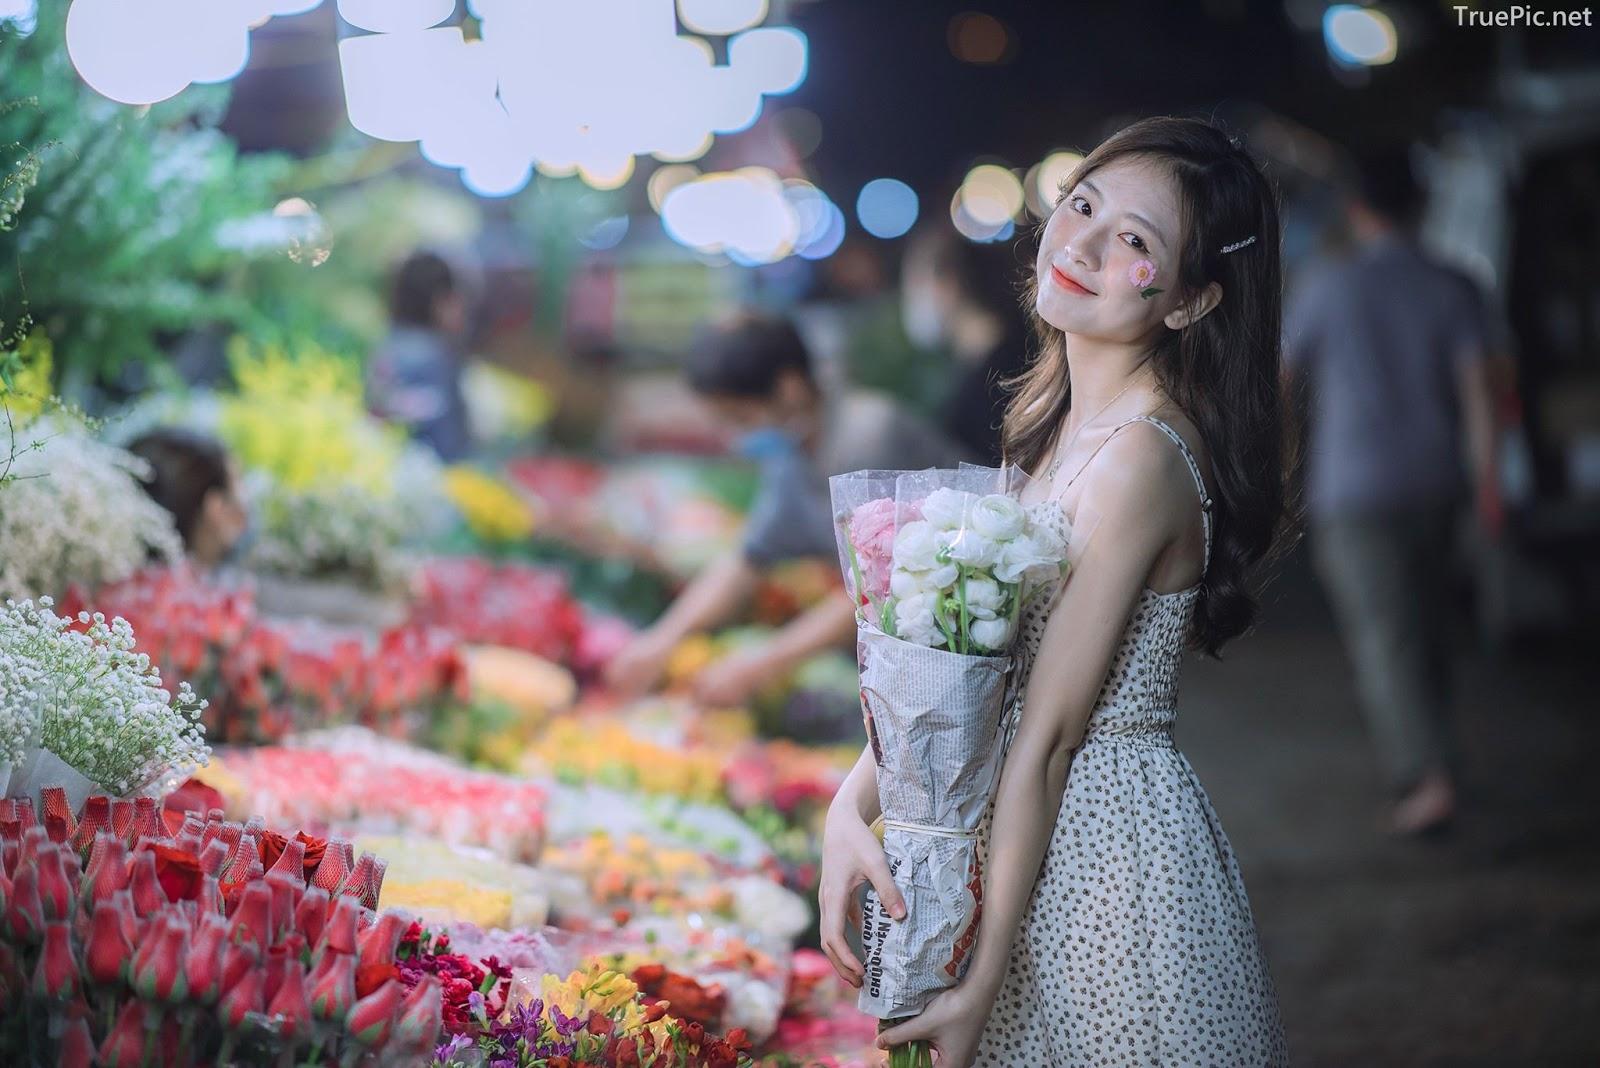 Vietnamese Hot Girl Linh Hoai - Strolling on the flower street - TruePic.net - Picture 3